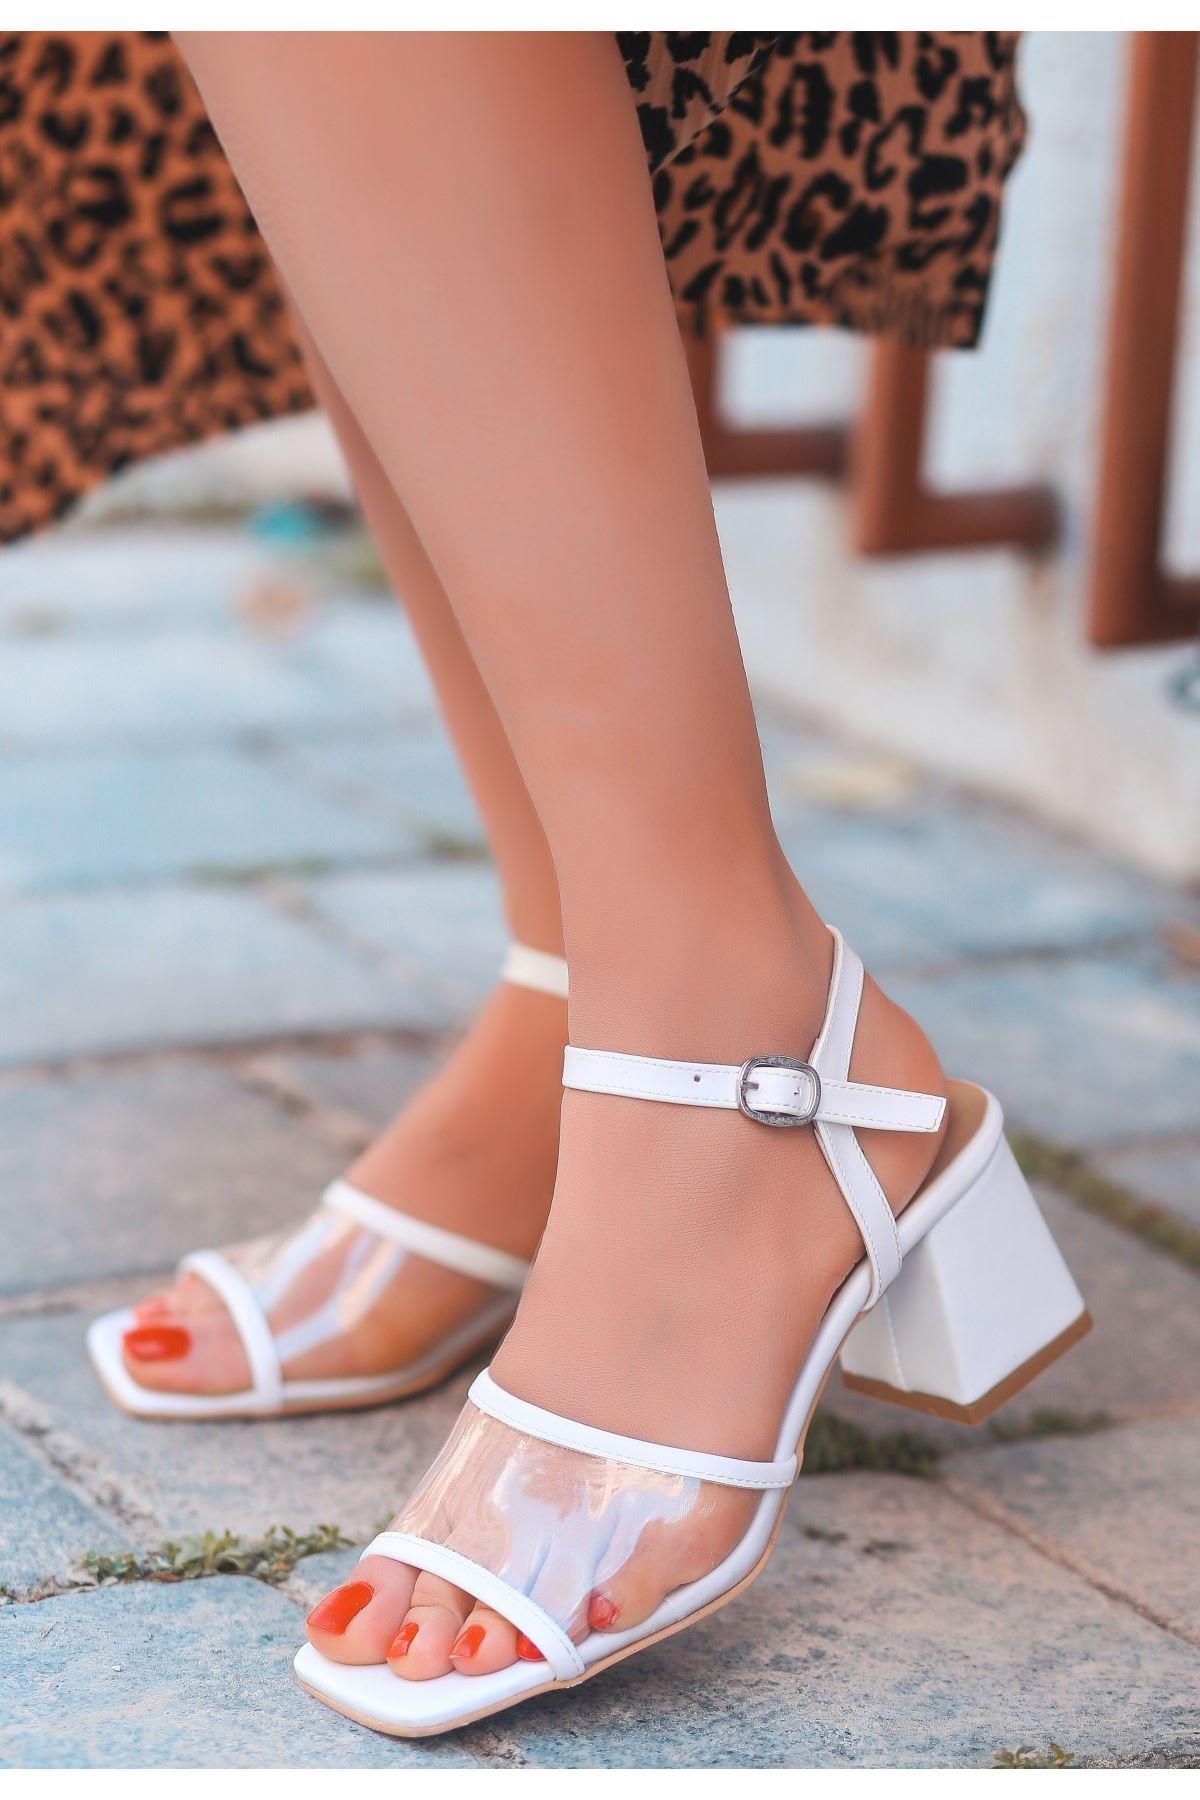 Riga Beyaz Cilt Şeffaf Detaylı Topuklu Ayakkabı